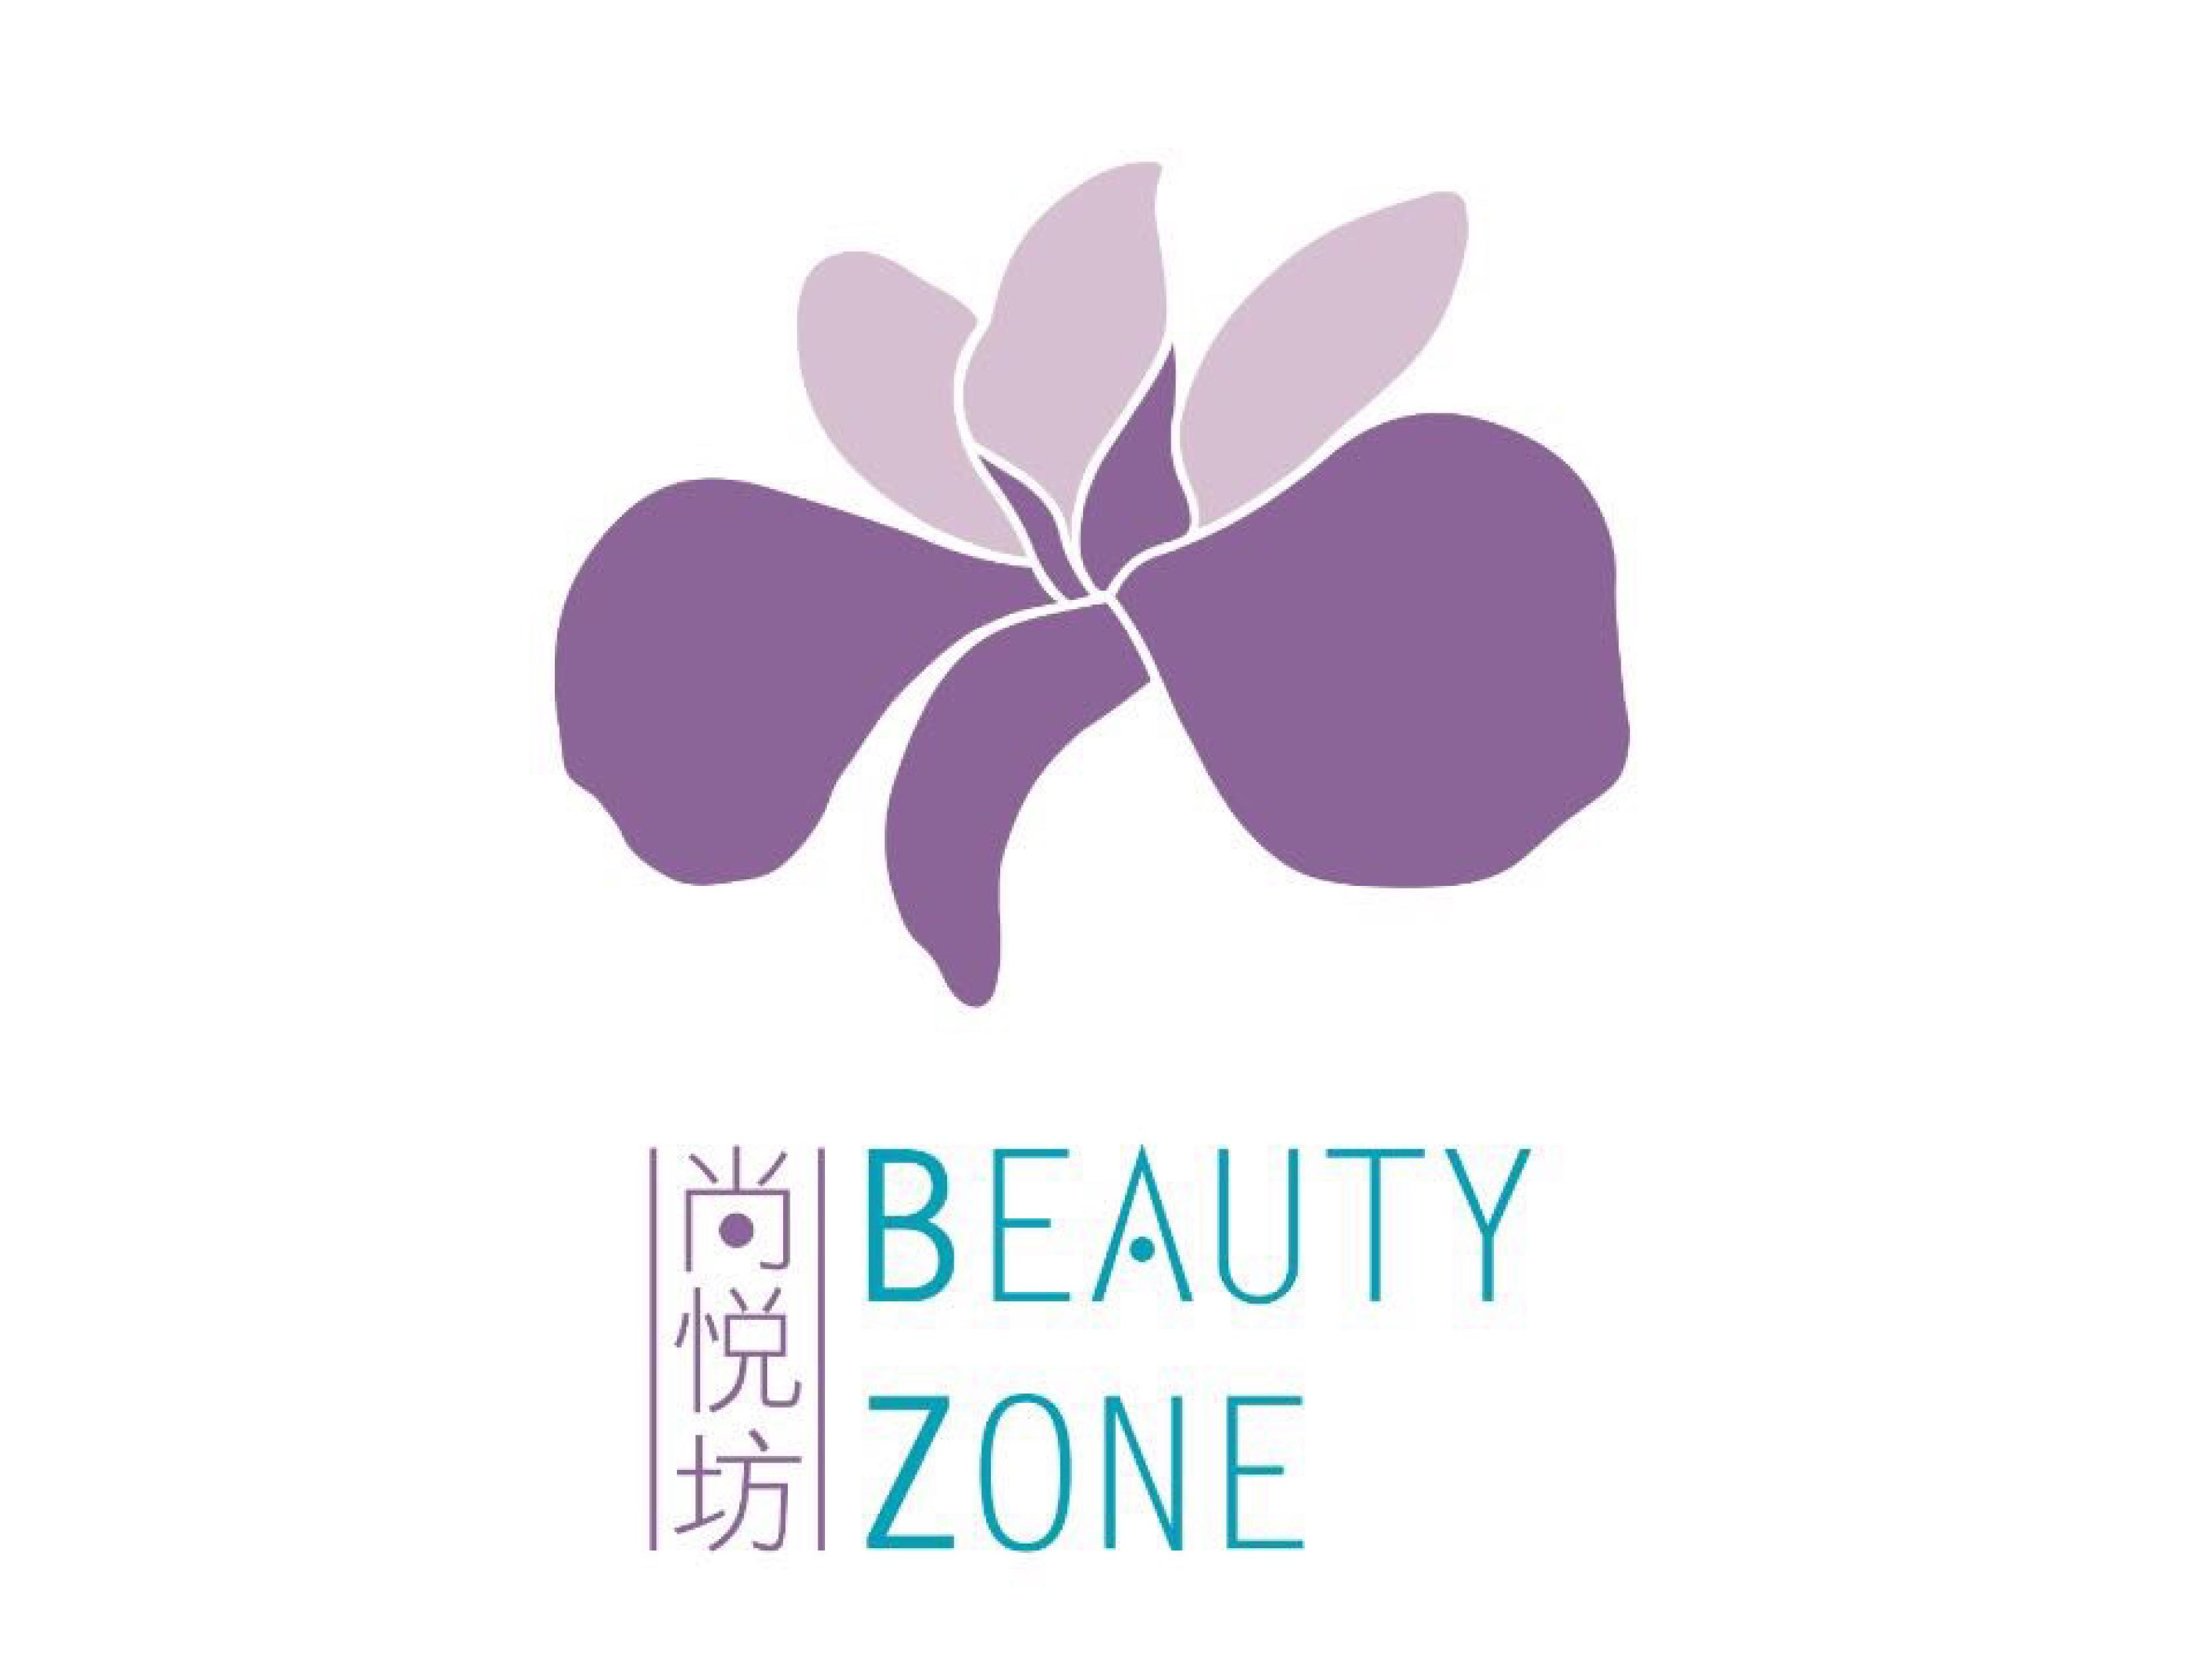 Beauty Zone Ltd - Macau Yellow Pages - Macau local business